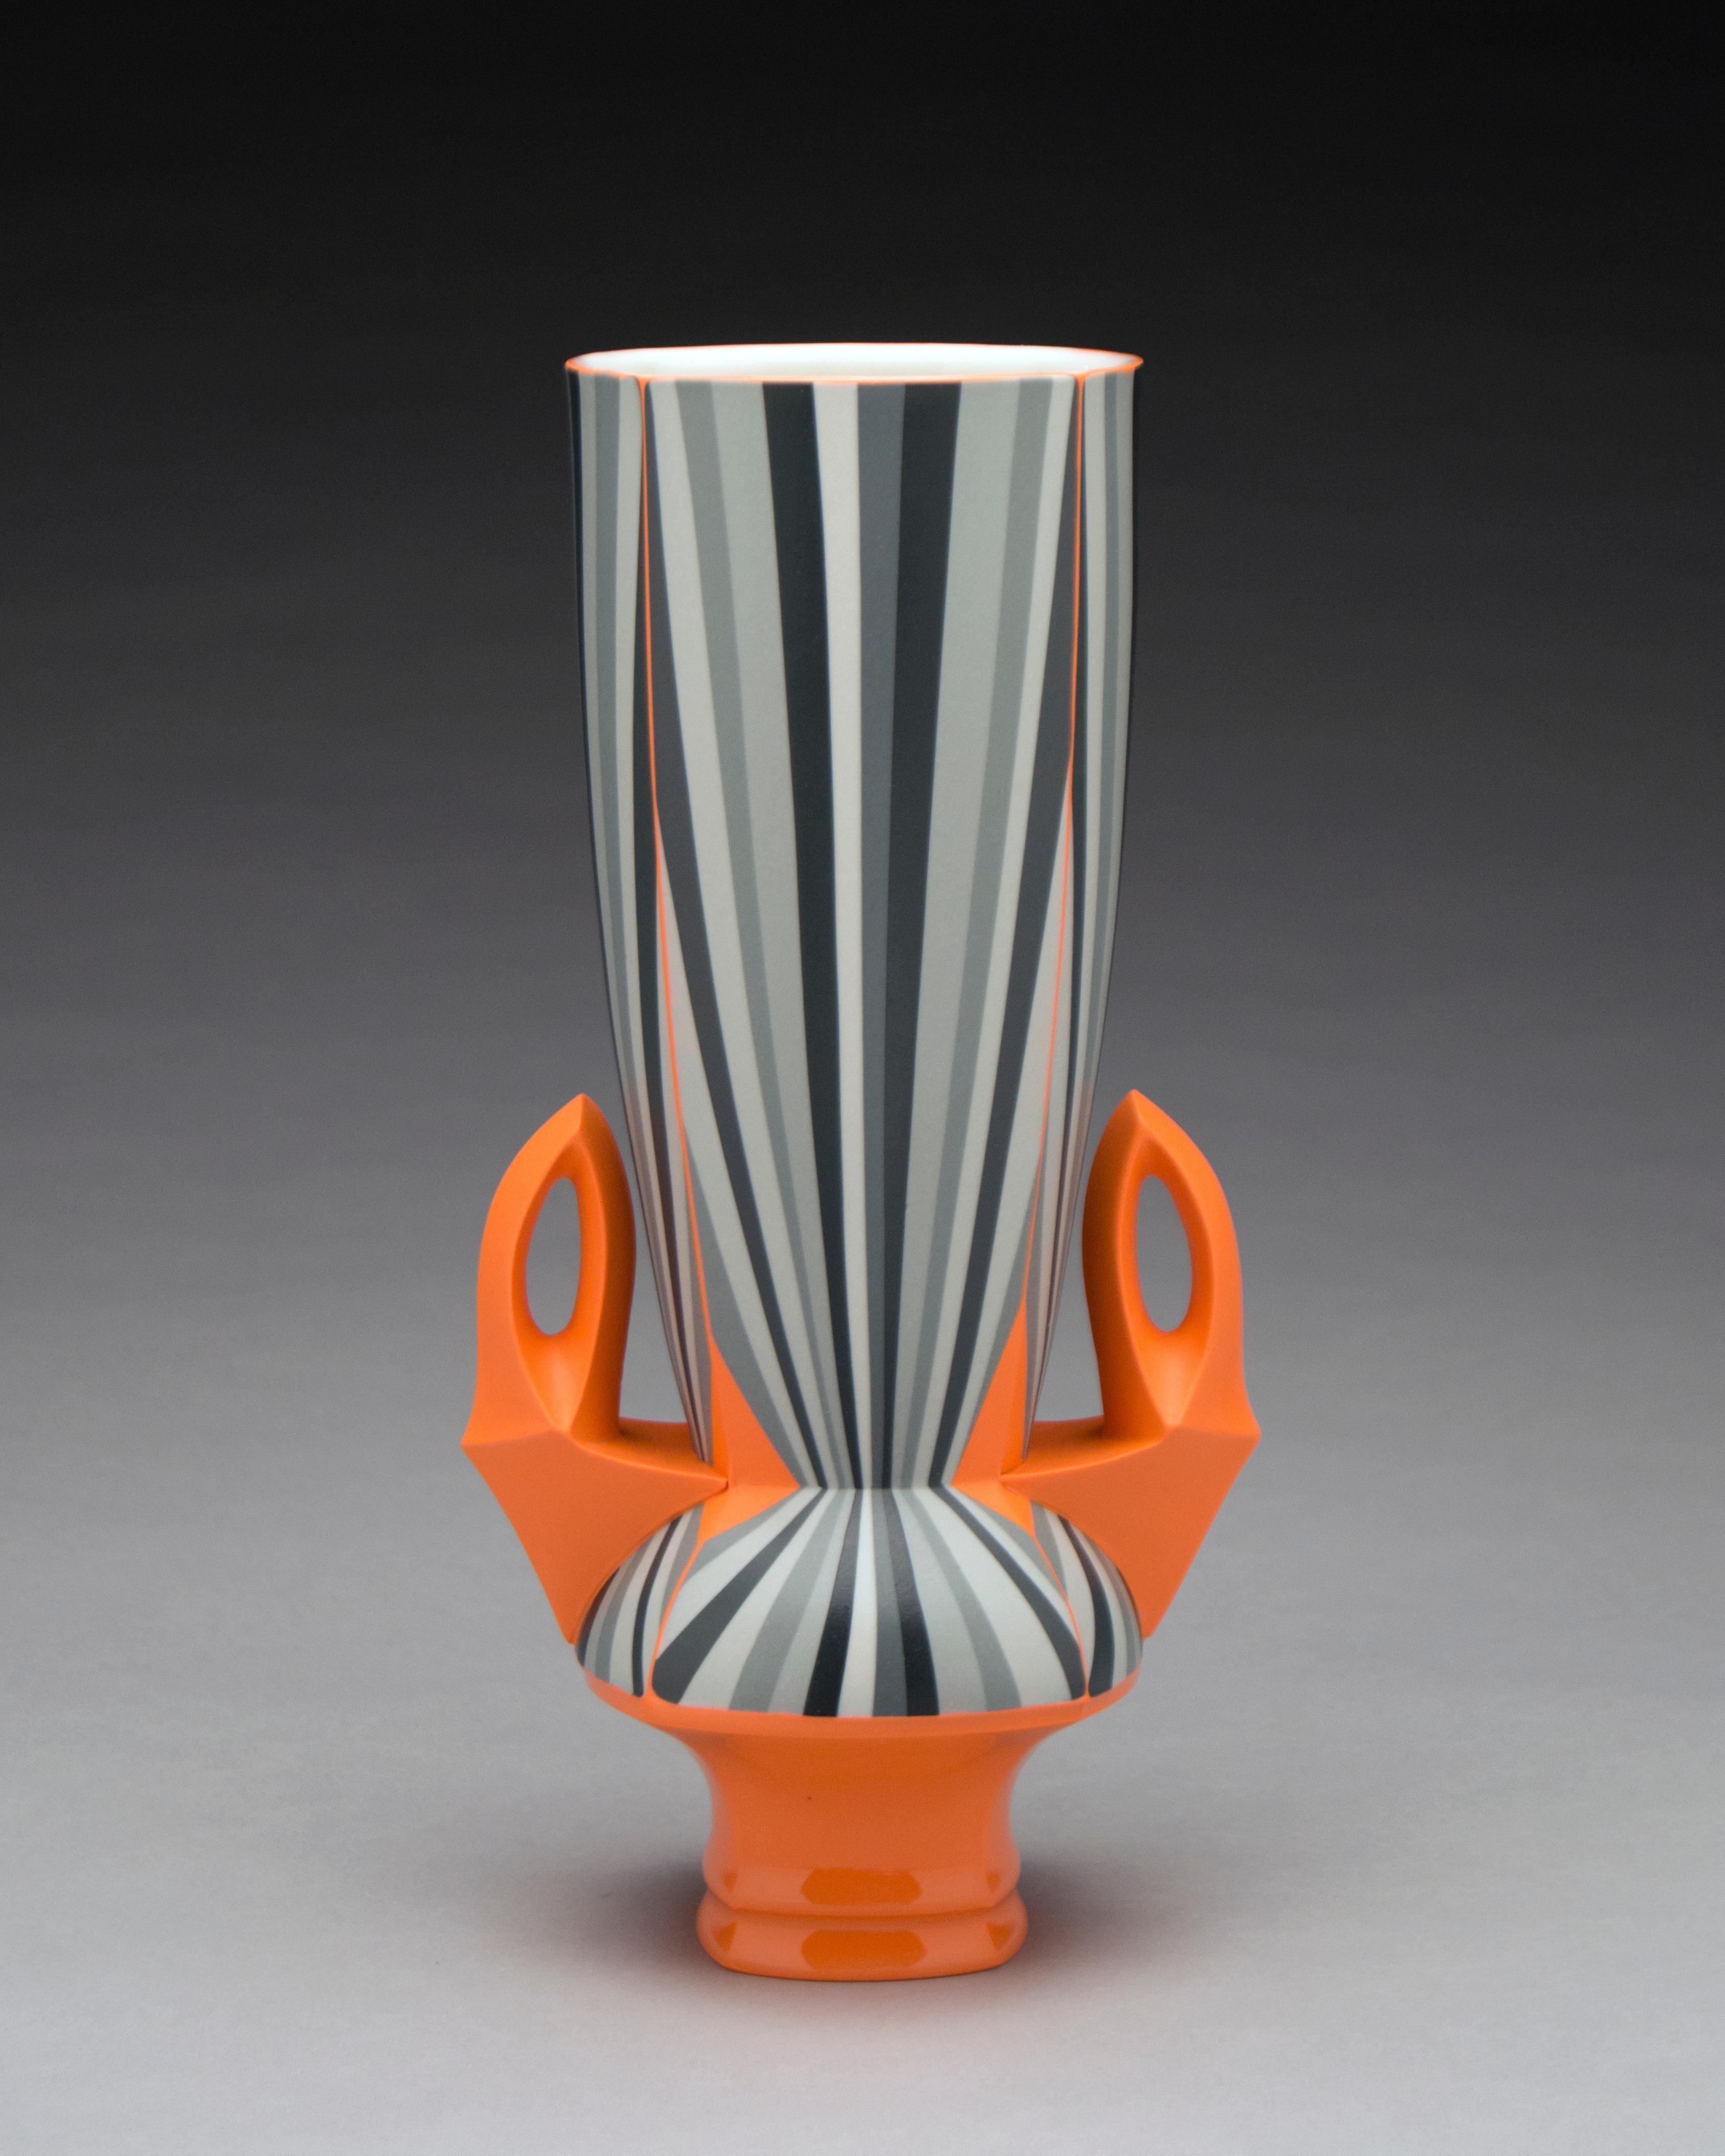 Orange Vase, Contemporary Design Porcelain Sculpture with Geometric Patterning